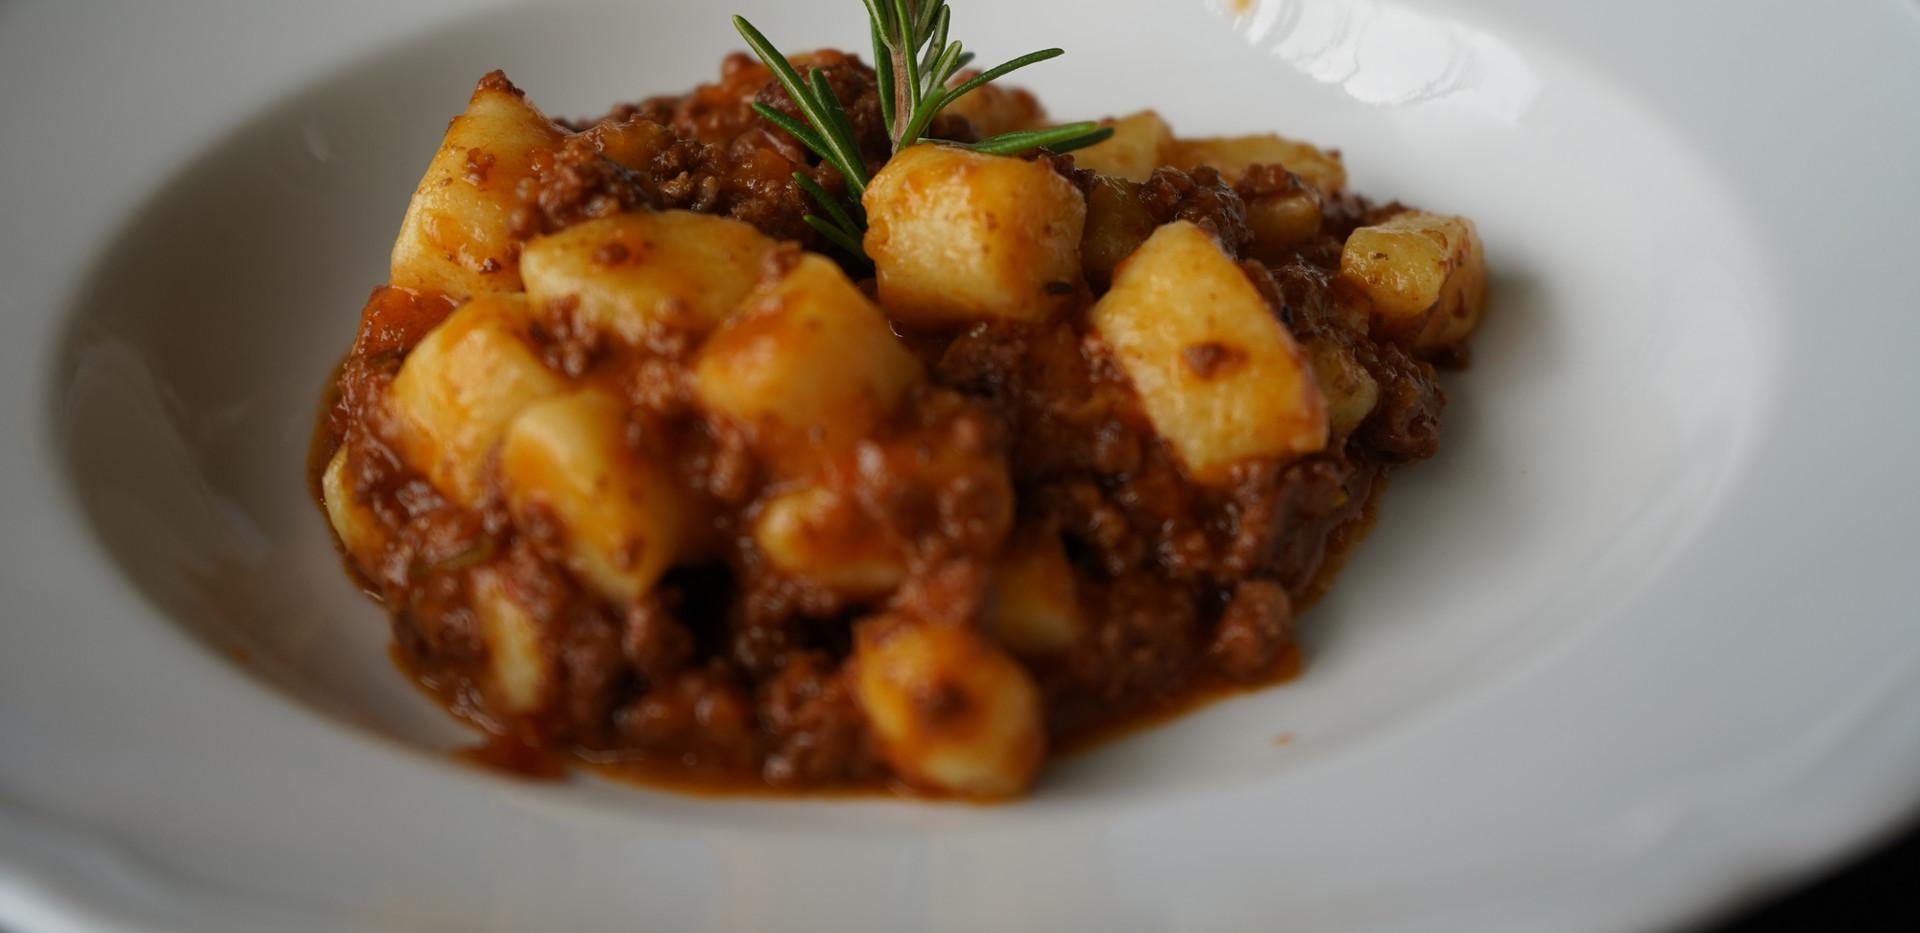 Full-day in Chianti Classico - gourmet lunch